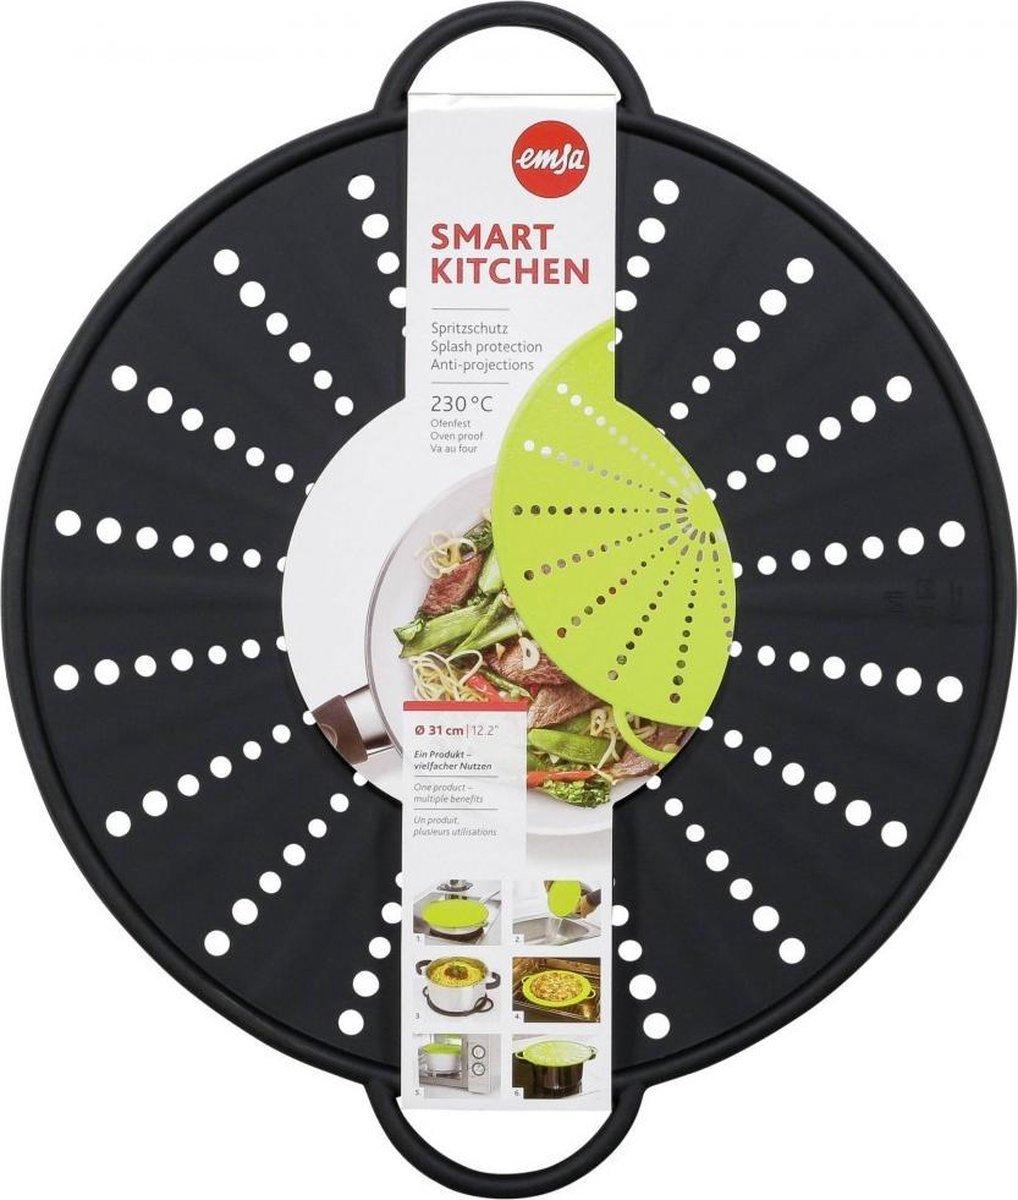 Smart Kitchen spatdeksel 31cm